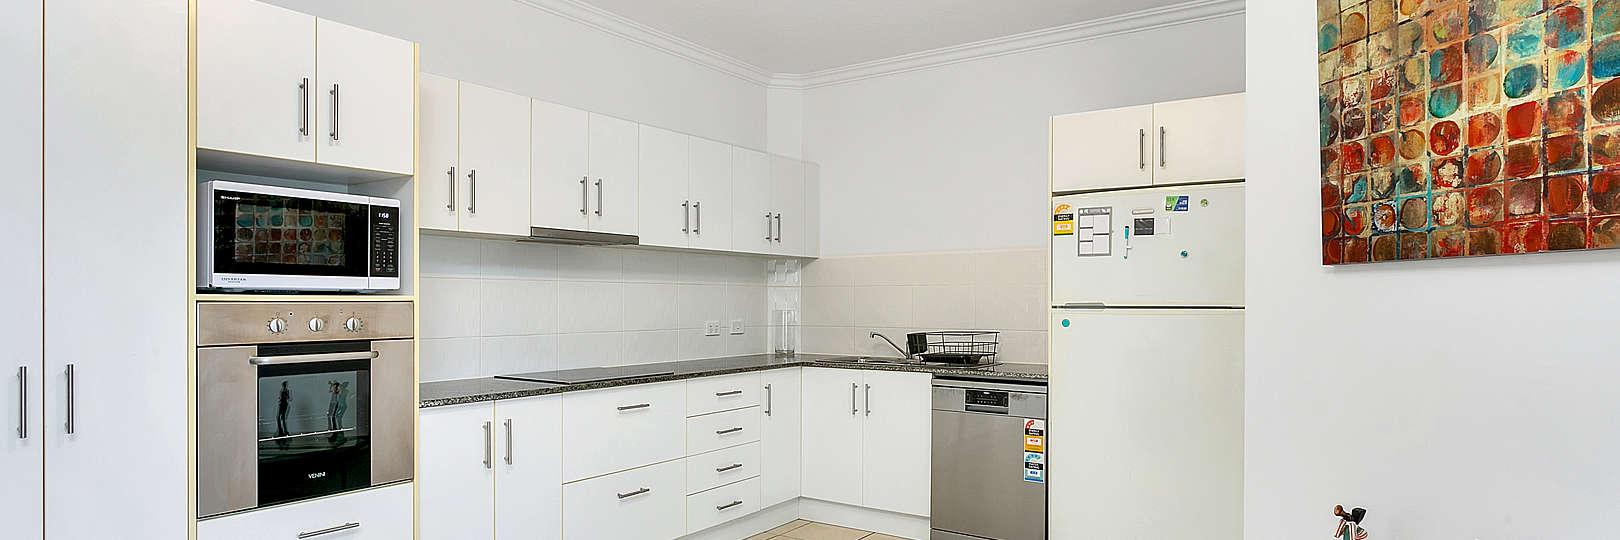 Bohemia Apartments 13 - 2